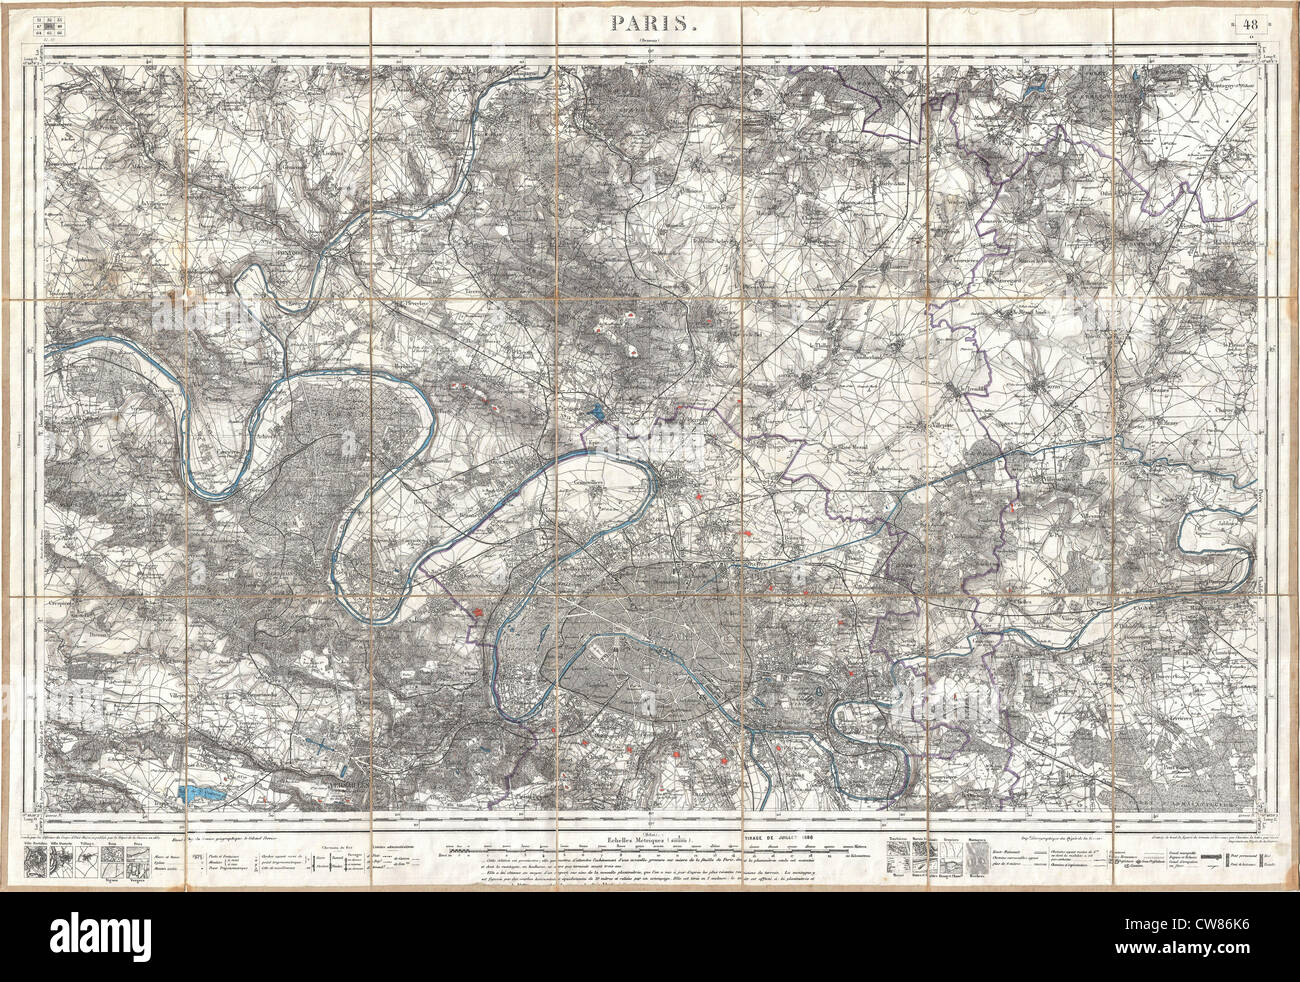 1886 Depot de la Guerre Pocket Map of Paris and Environs - Stock Image